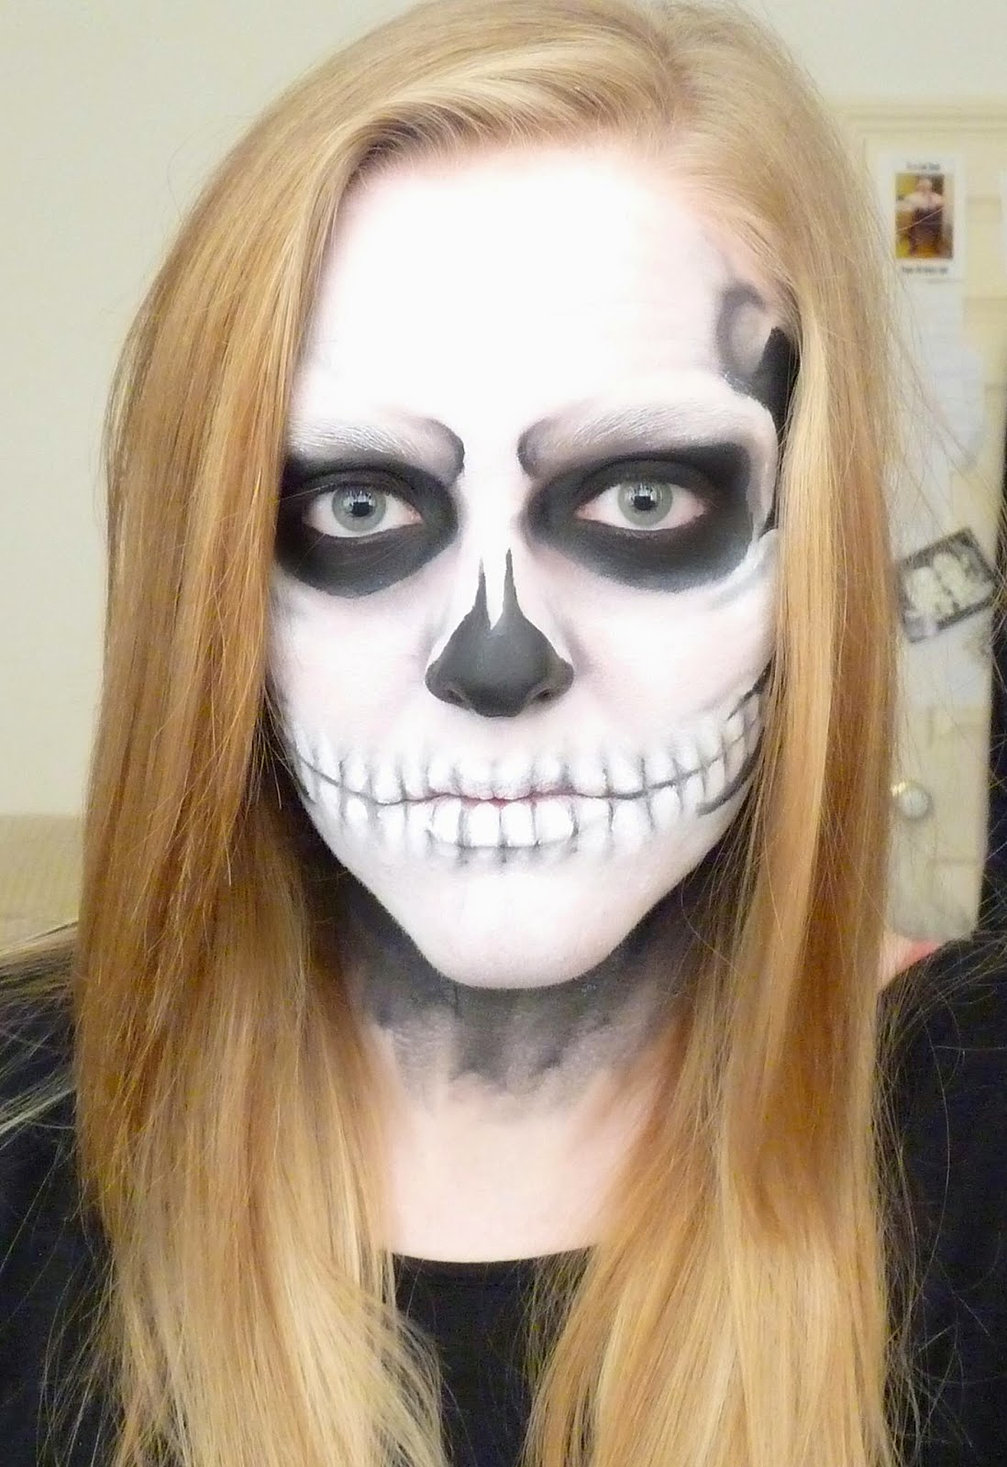 makeupbylouise | Halloween/Themed Makeup Portfolio